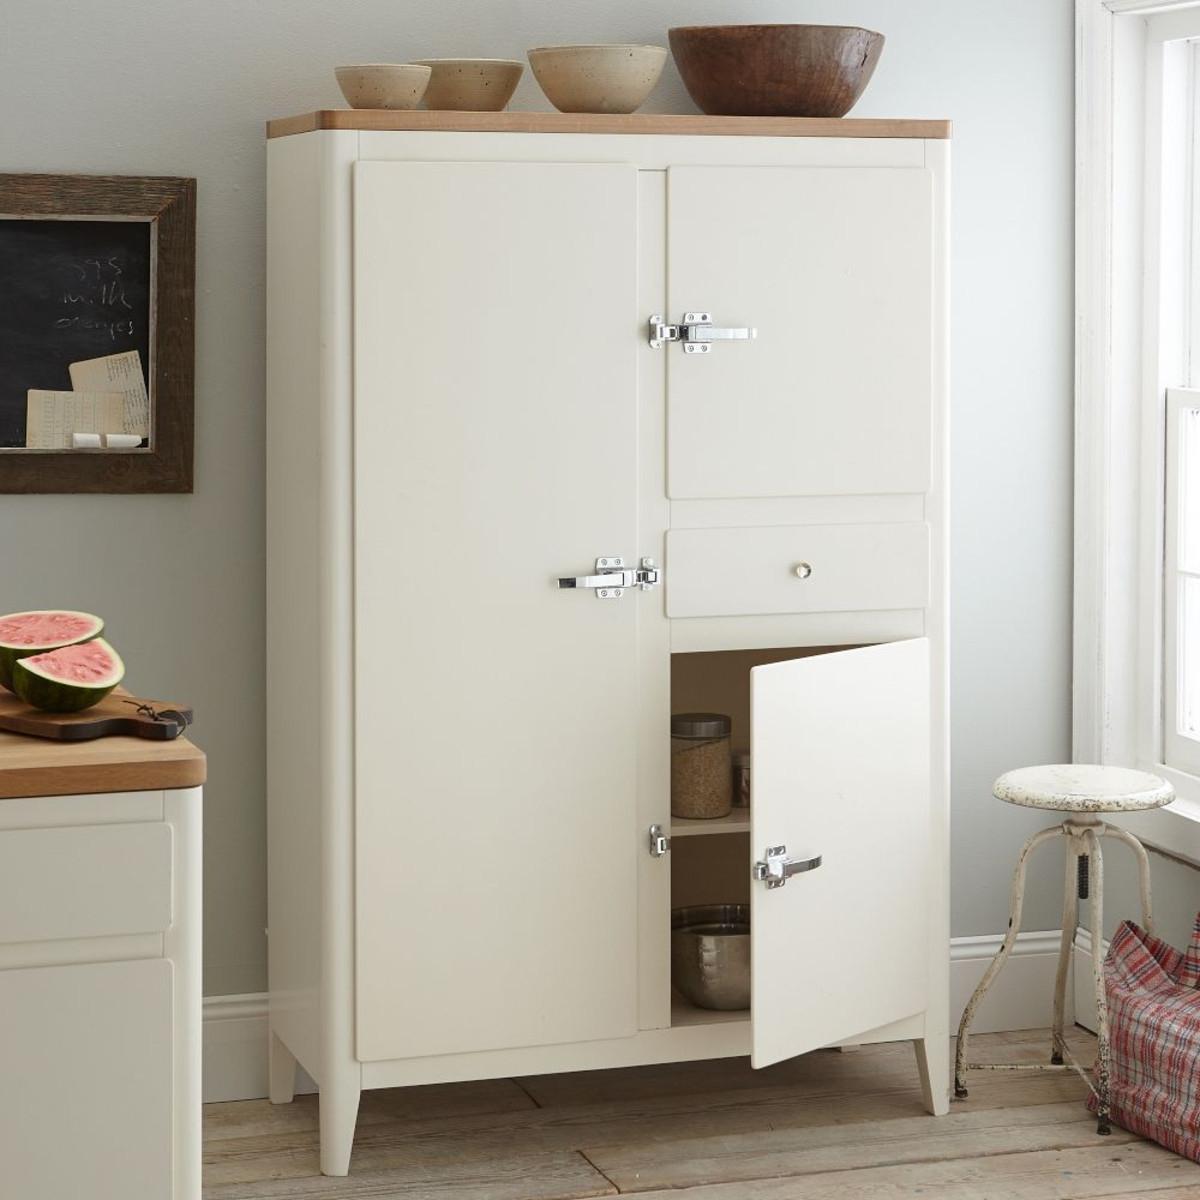 free standing kitchen larder cupboards remodel estimate 25 best ideas